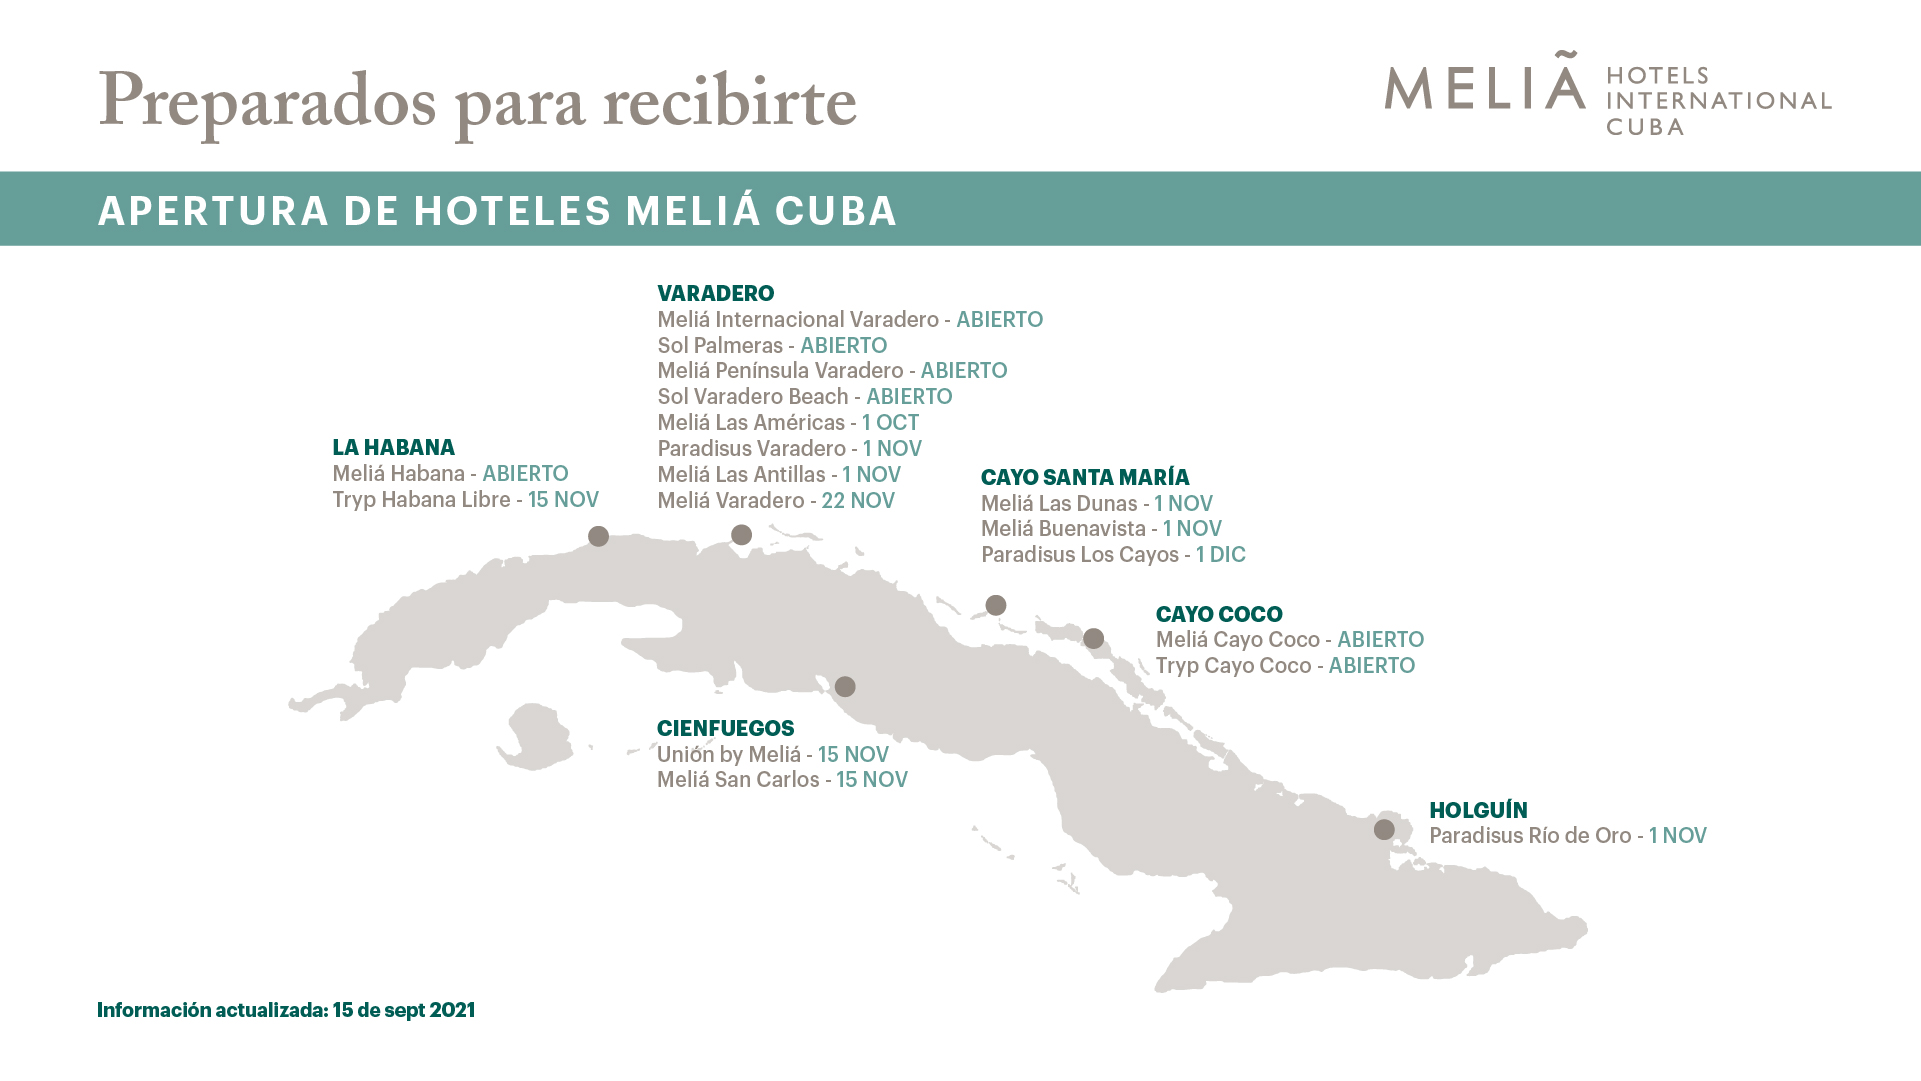 Offnungstermine MELIÃ Hotels   Bildquelle: https://twitter.com/MeliaCuba/status/1438527316267786241/photo/1 © Twitter/MELIÃ   Bilder sind in der Regel urheberrechtlich geschützt